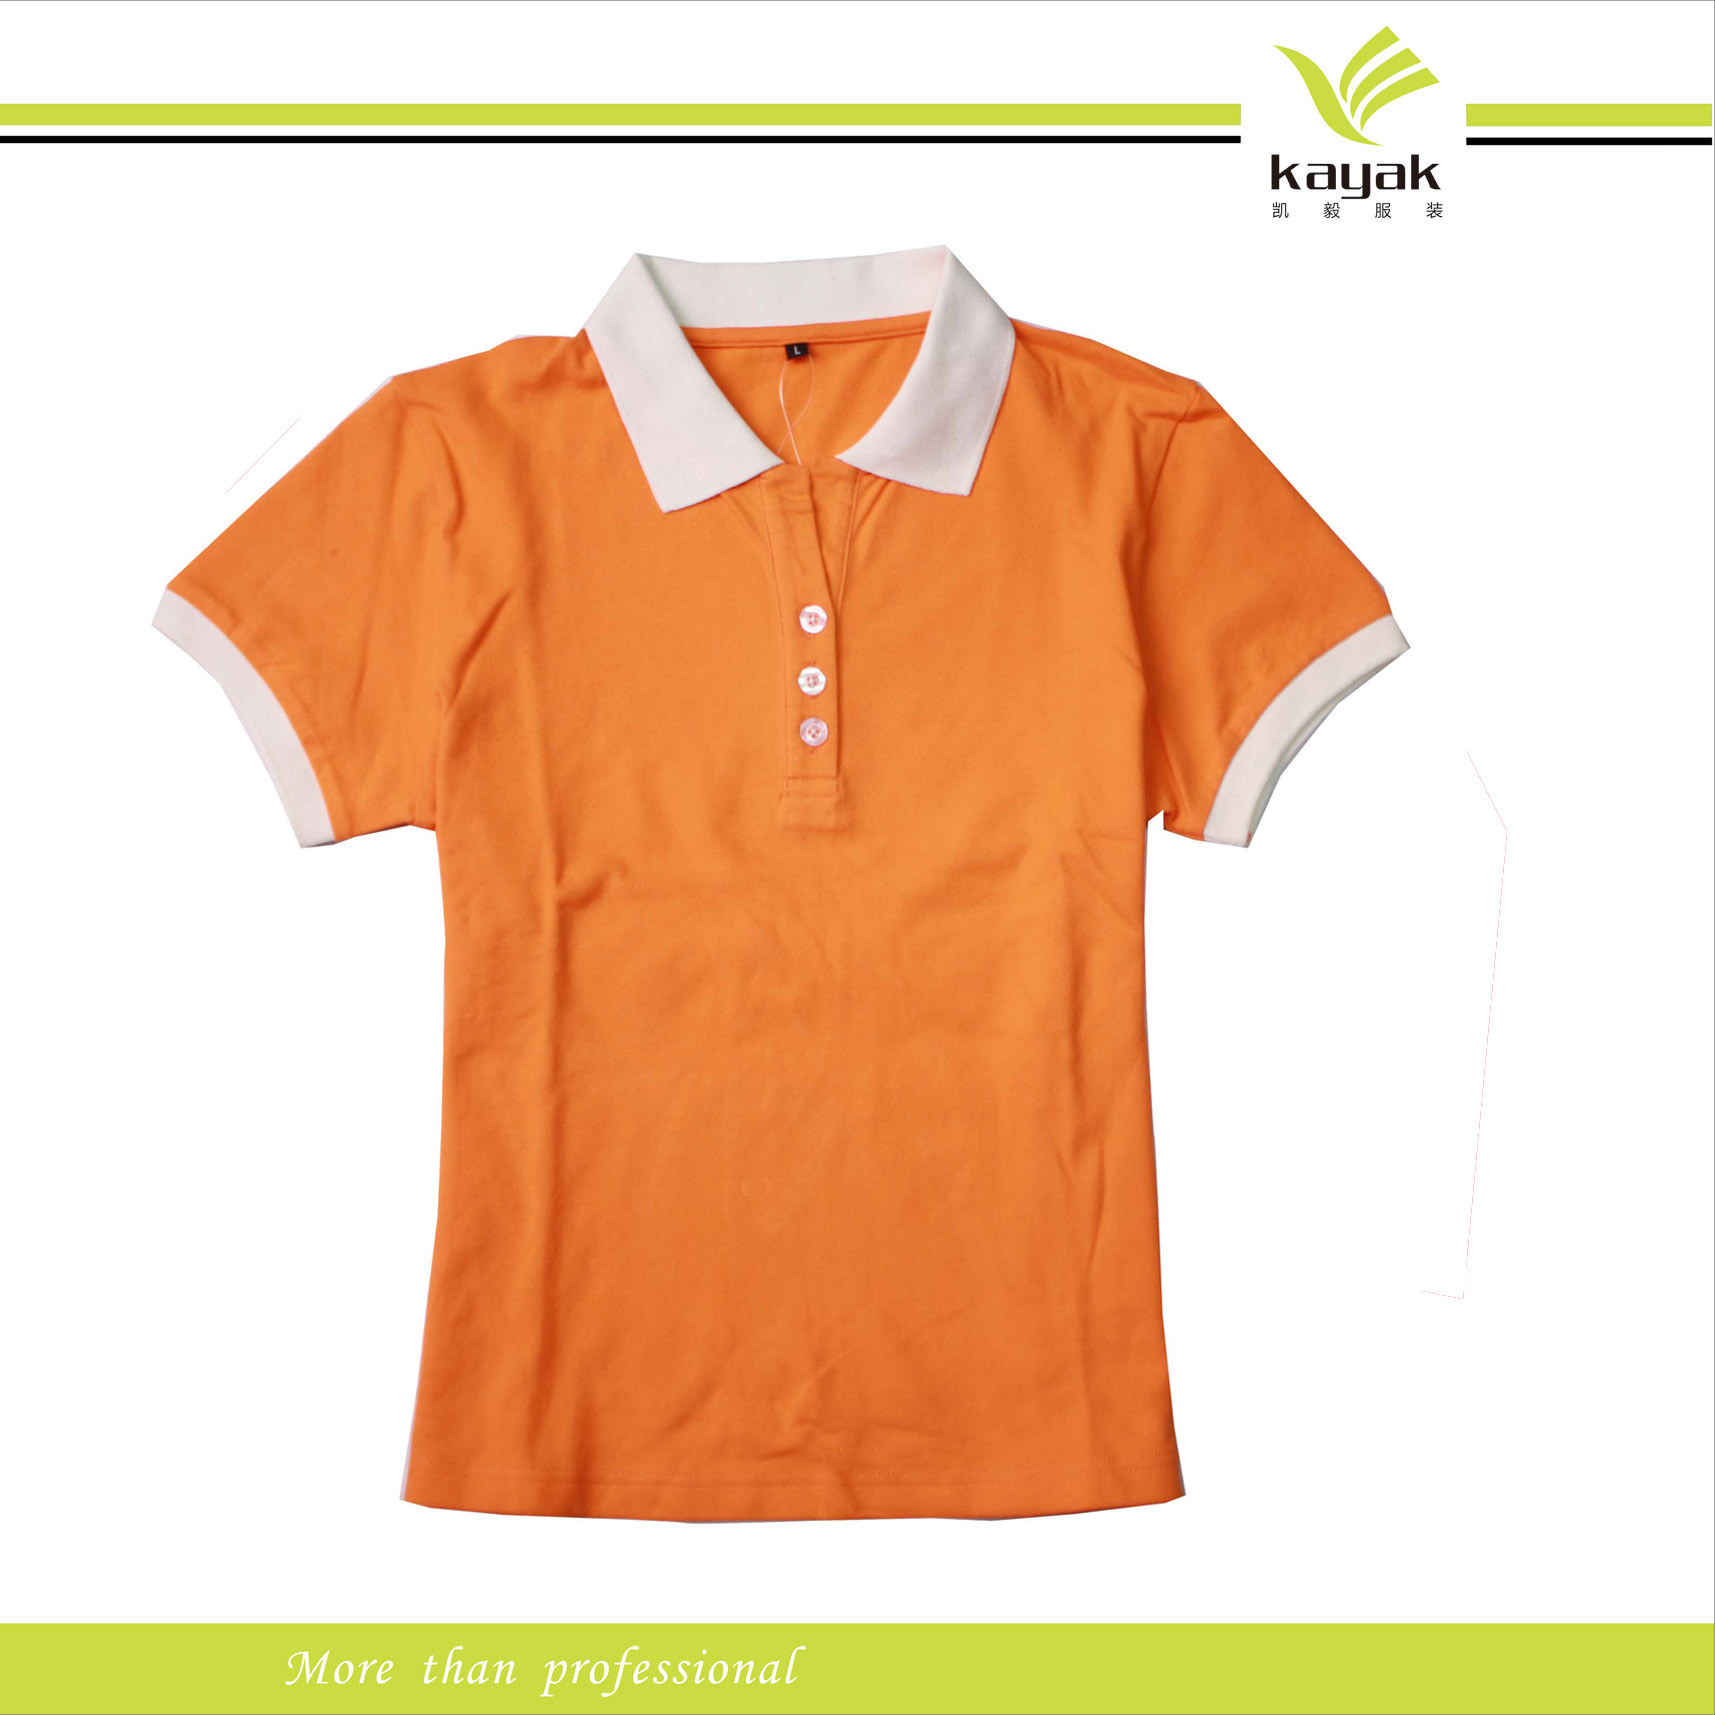 T Shirt Collar Types